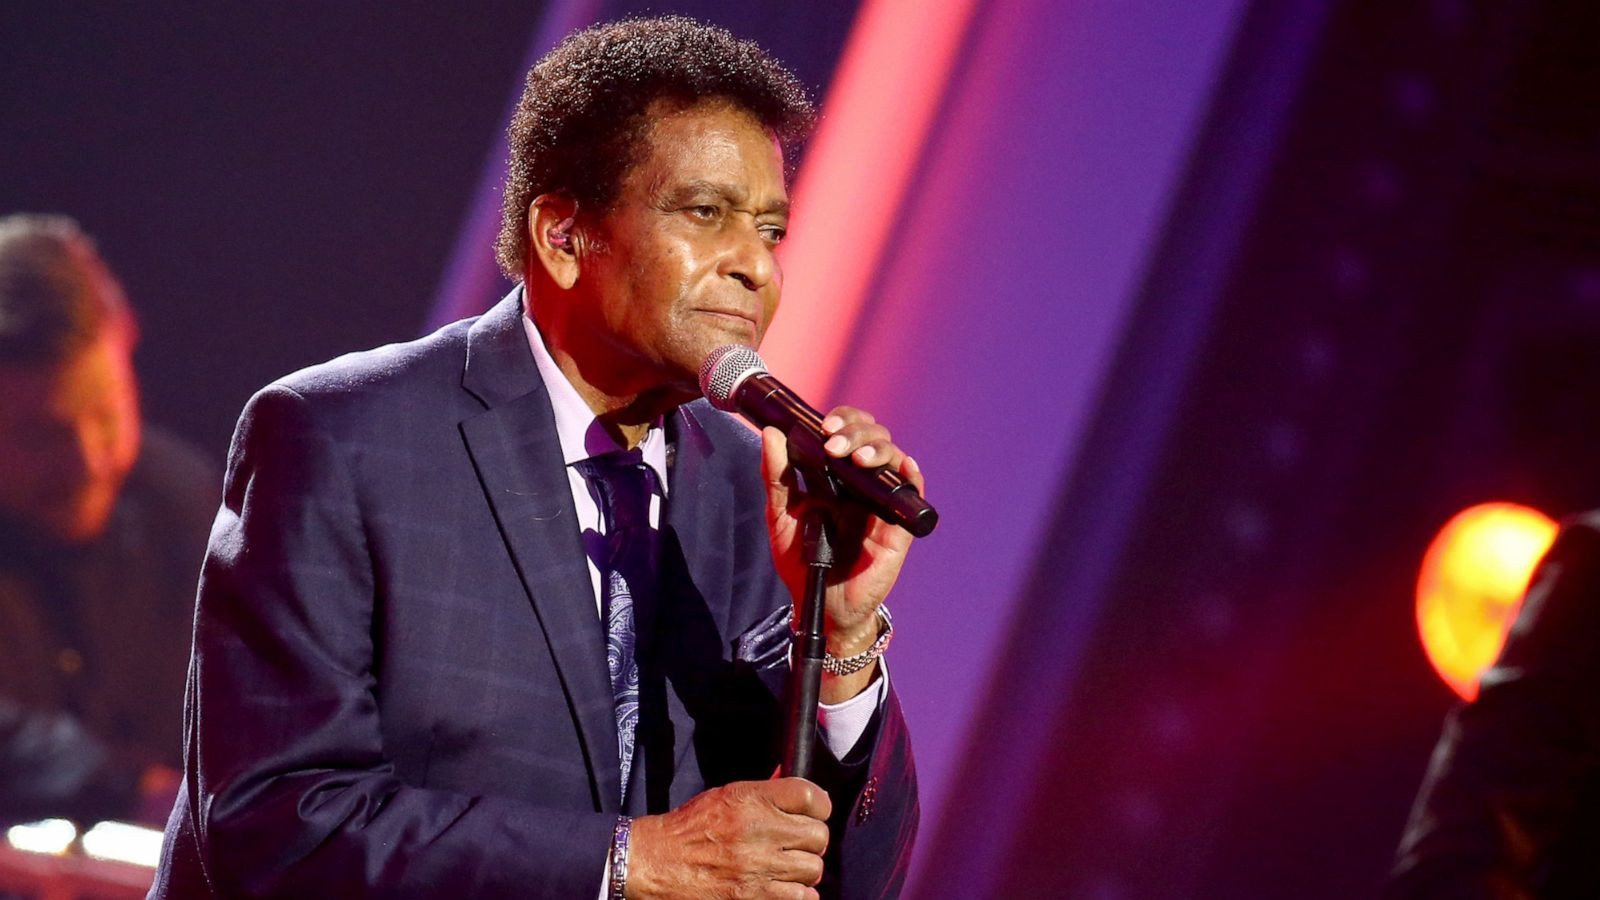 Charley Pride, Country musics first black superstar dies of Coronavirus at 86 lindaikejisblog